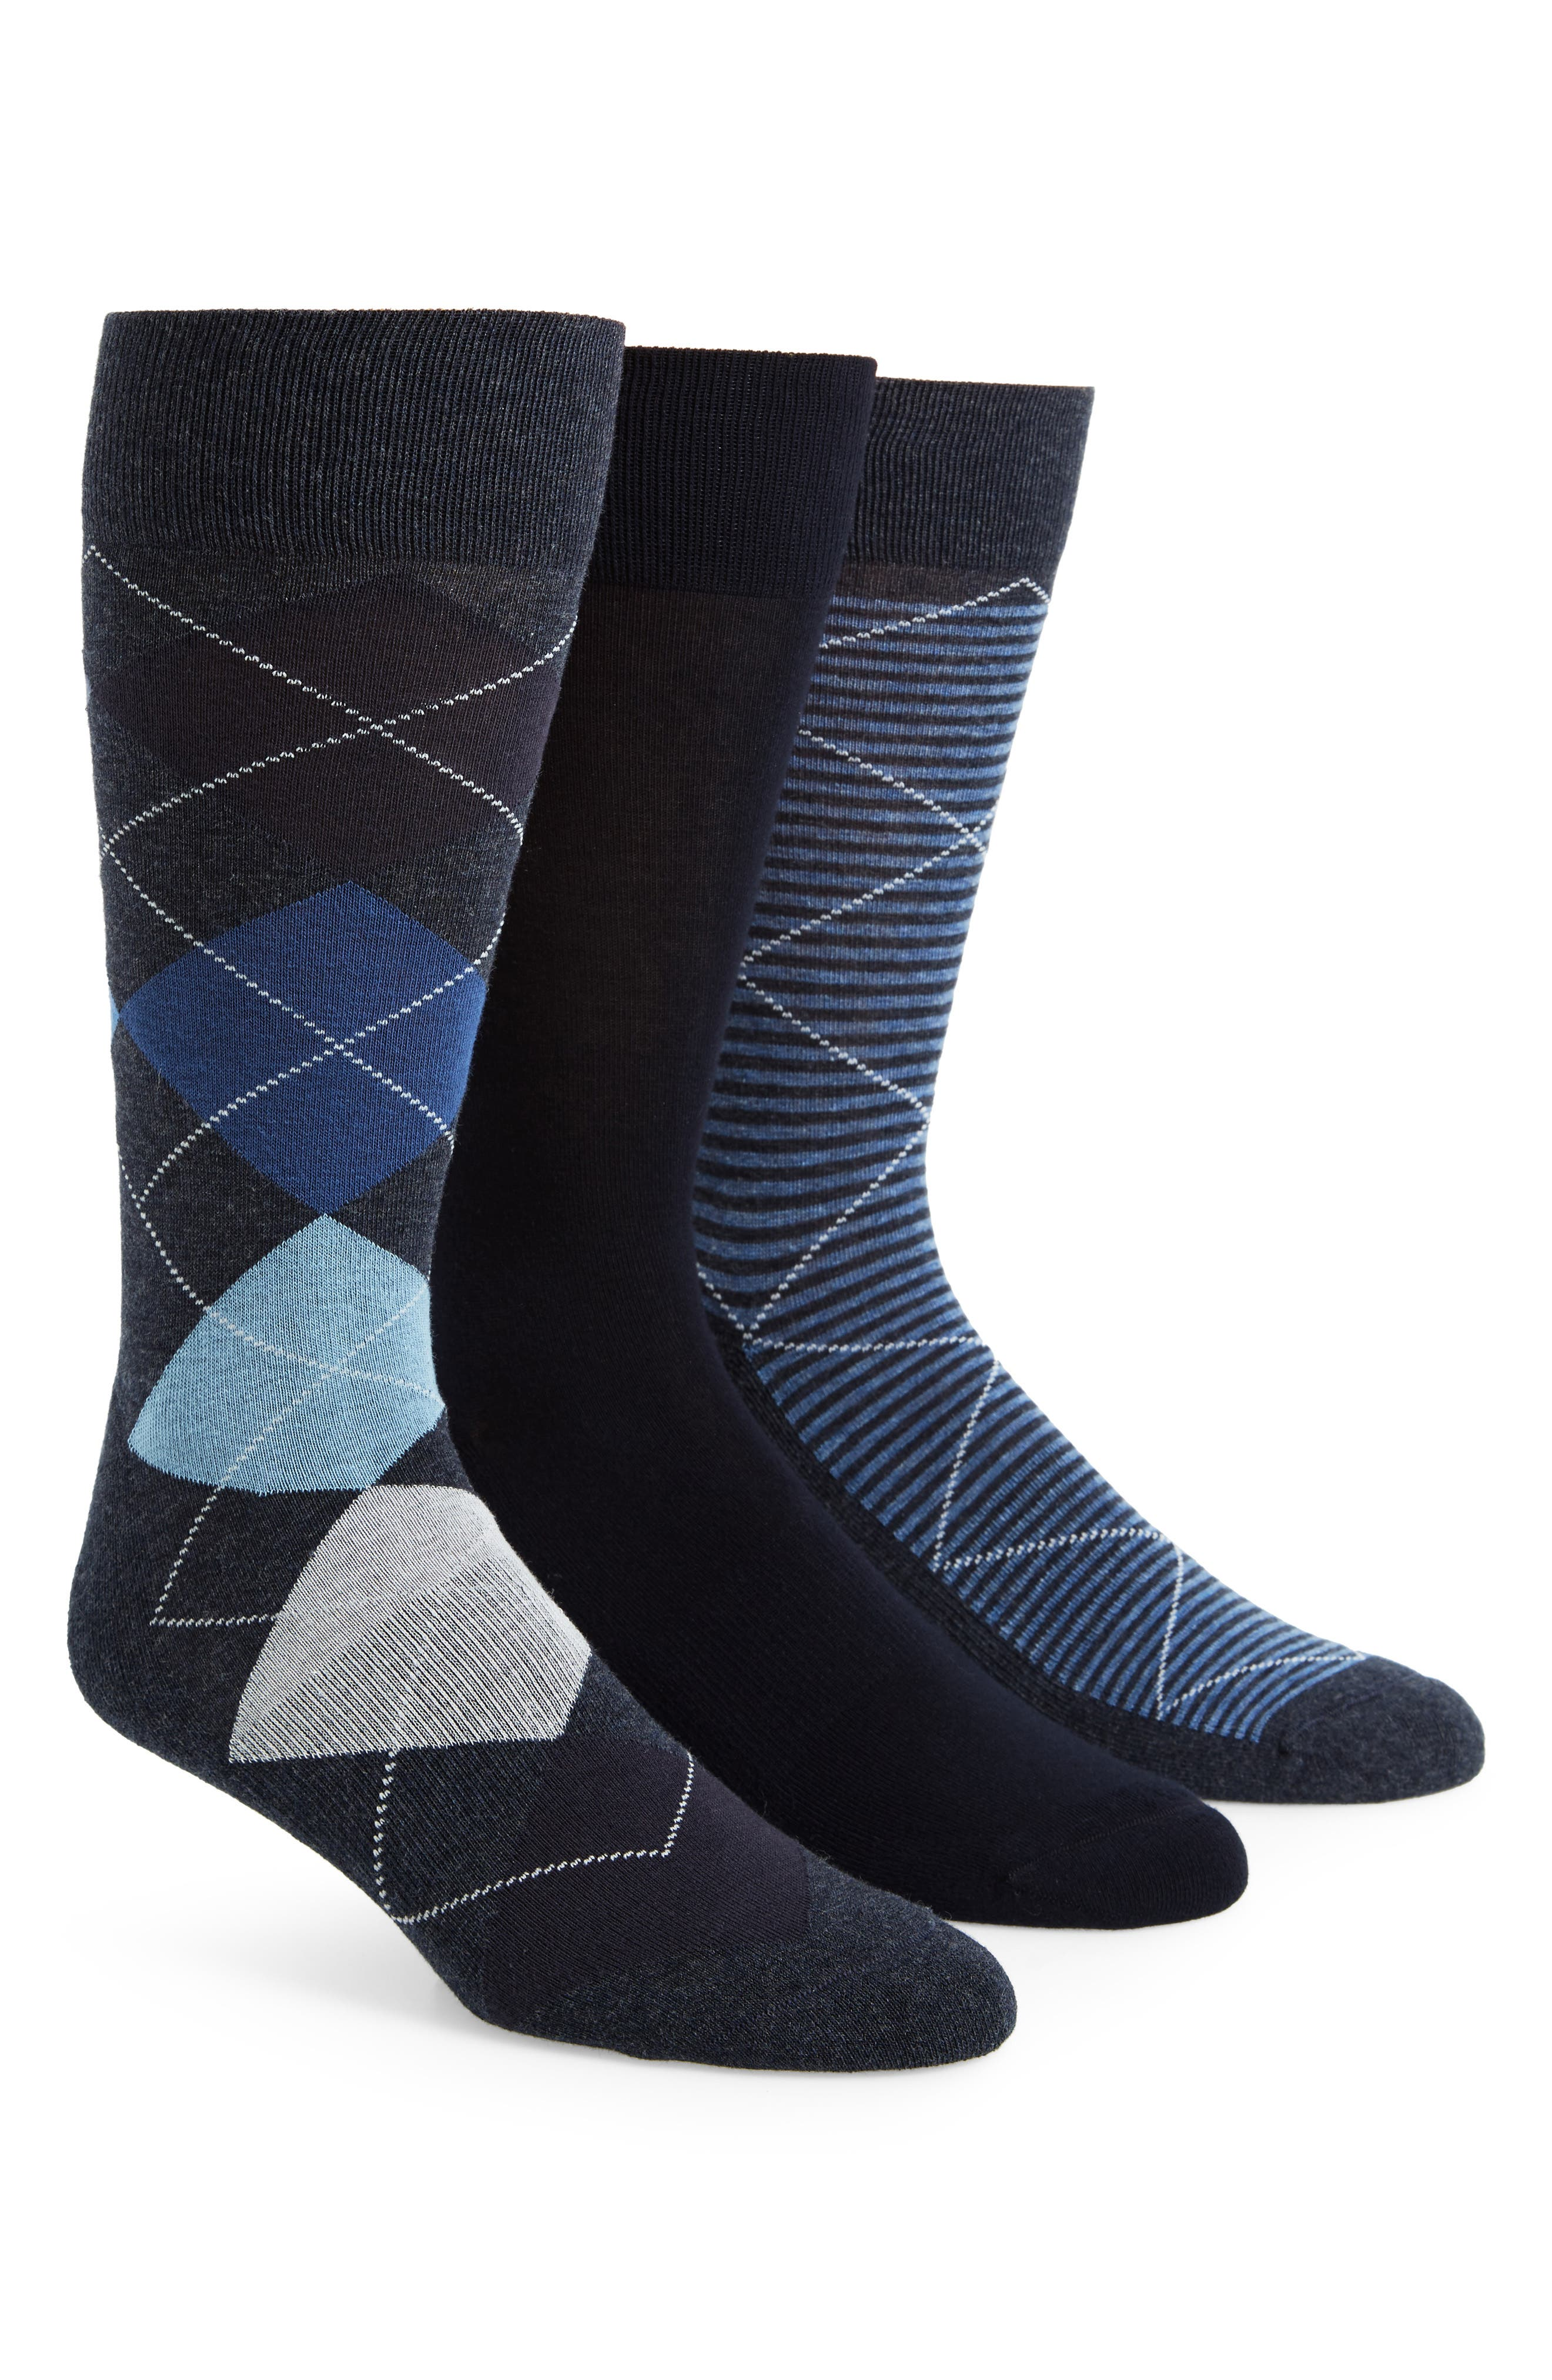 3-Pack Cotton Blend Socks,                             Main thumbnail 1, color,                             Navy